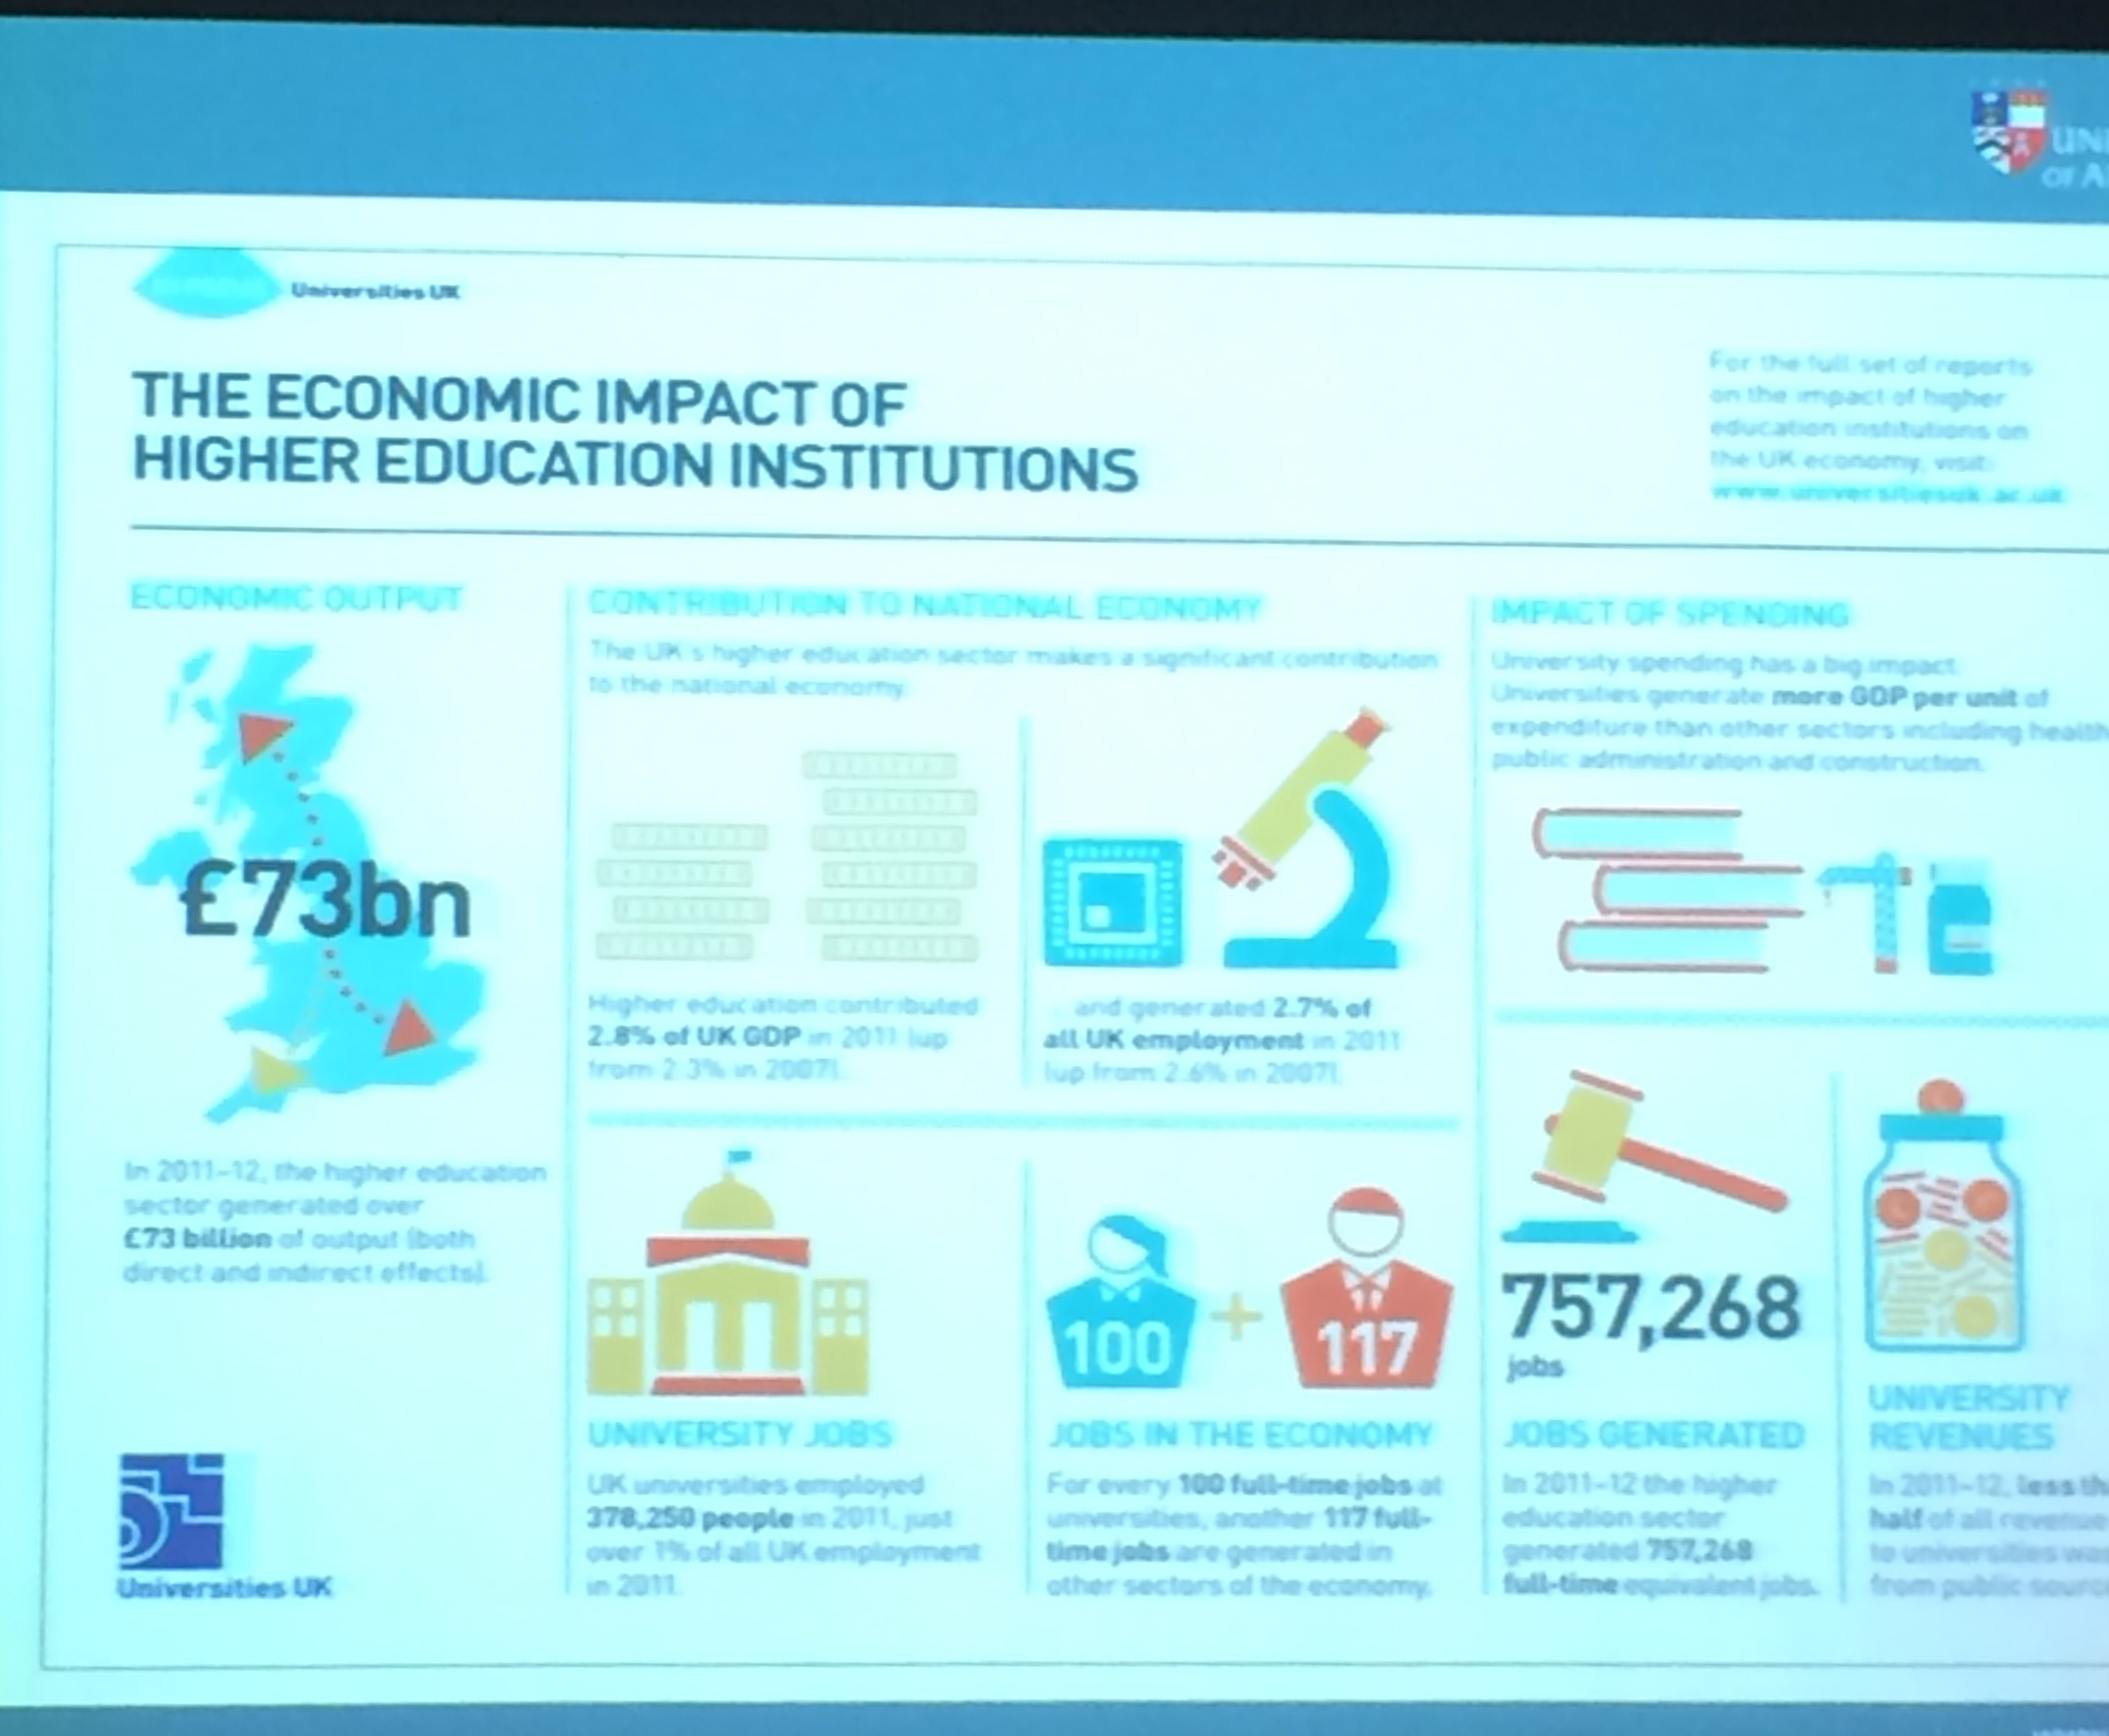 University economic contribution